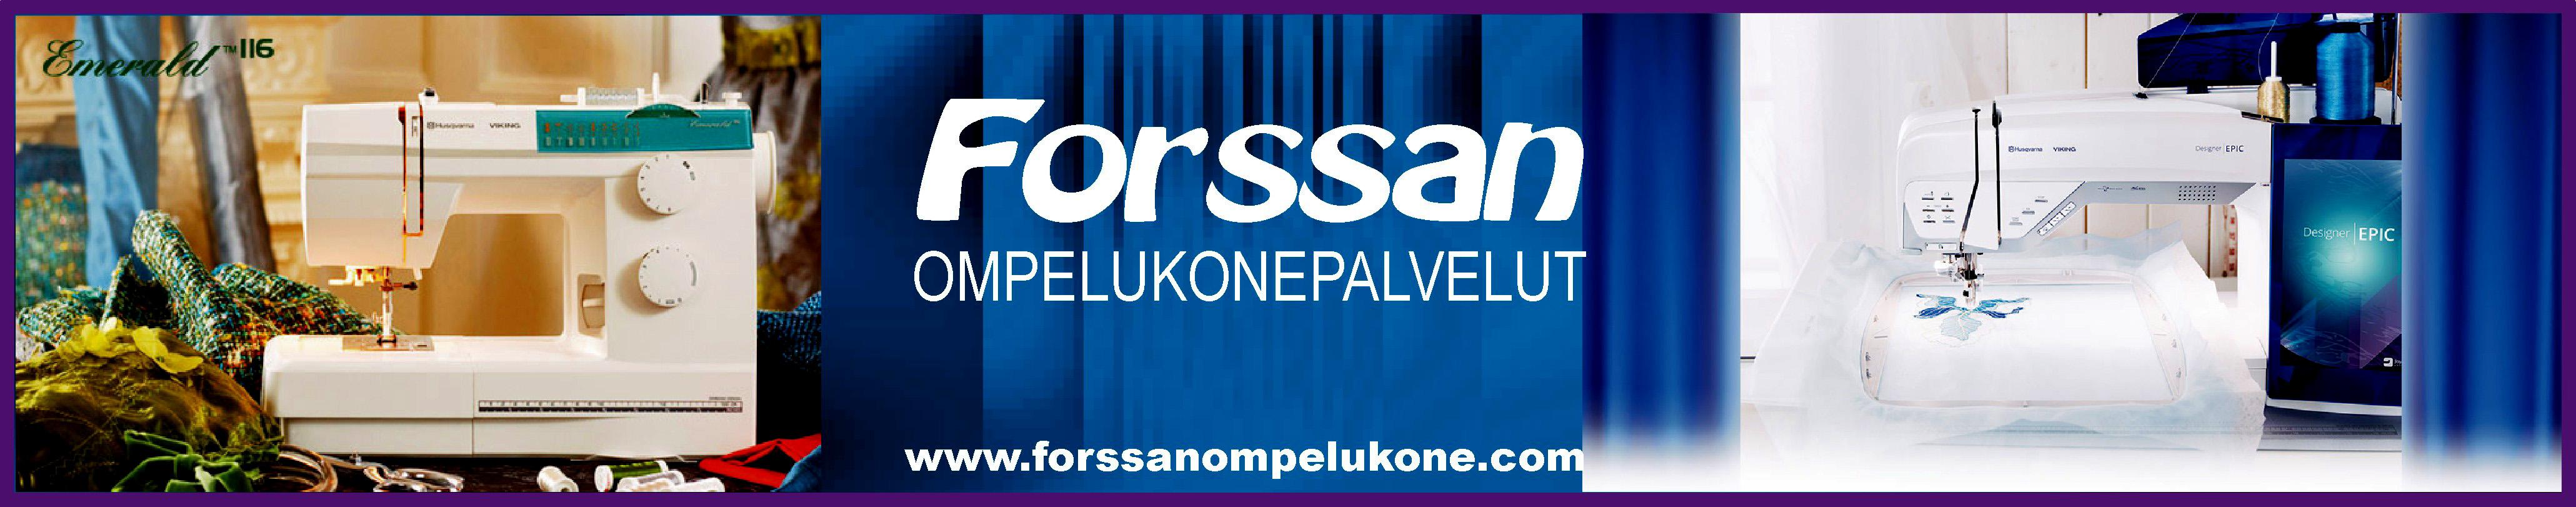 FORSSAN OMPELUKONE